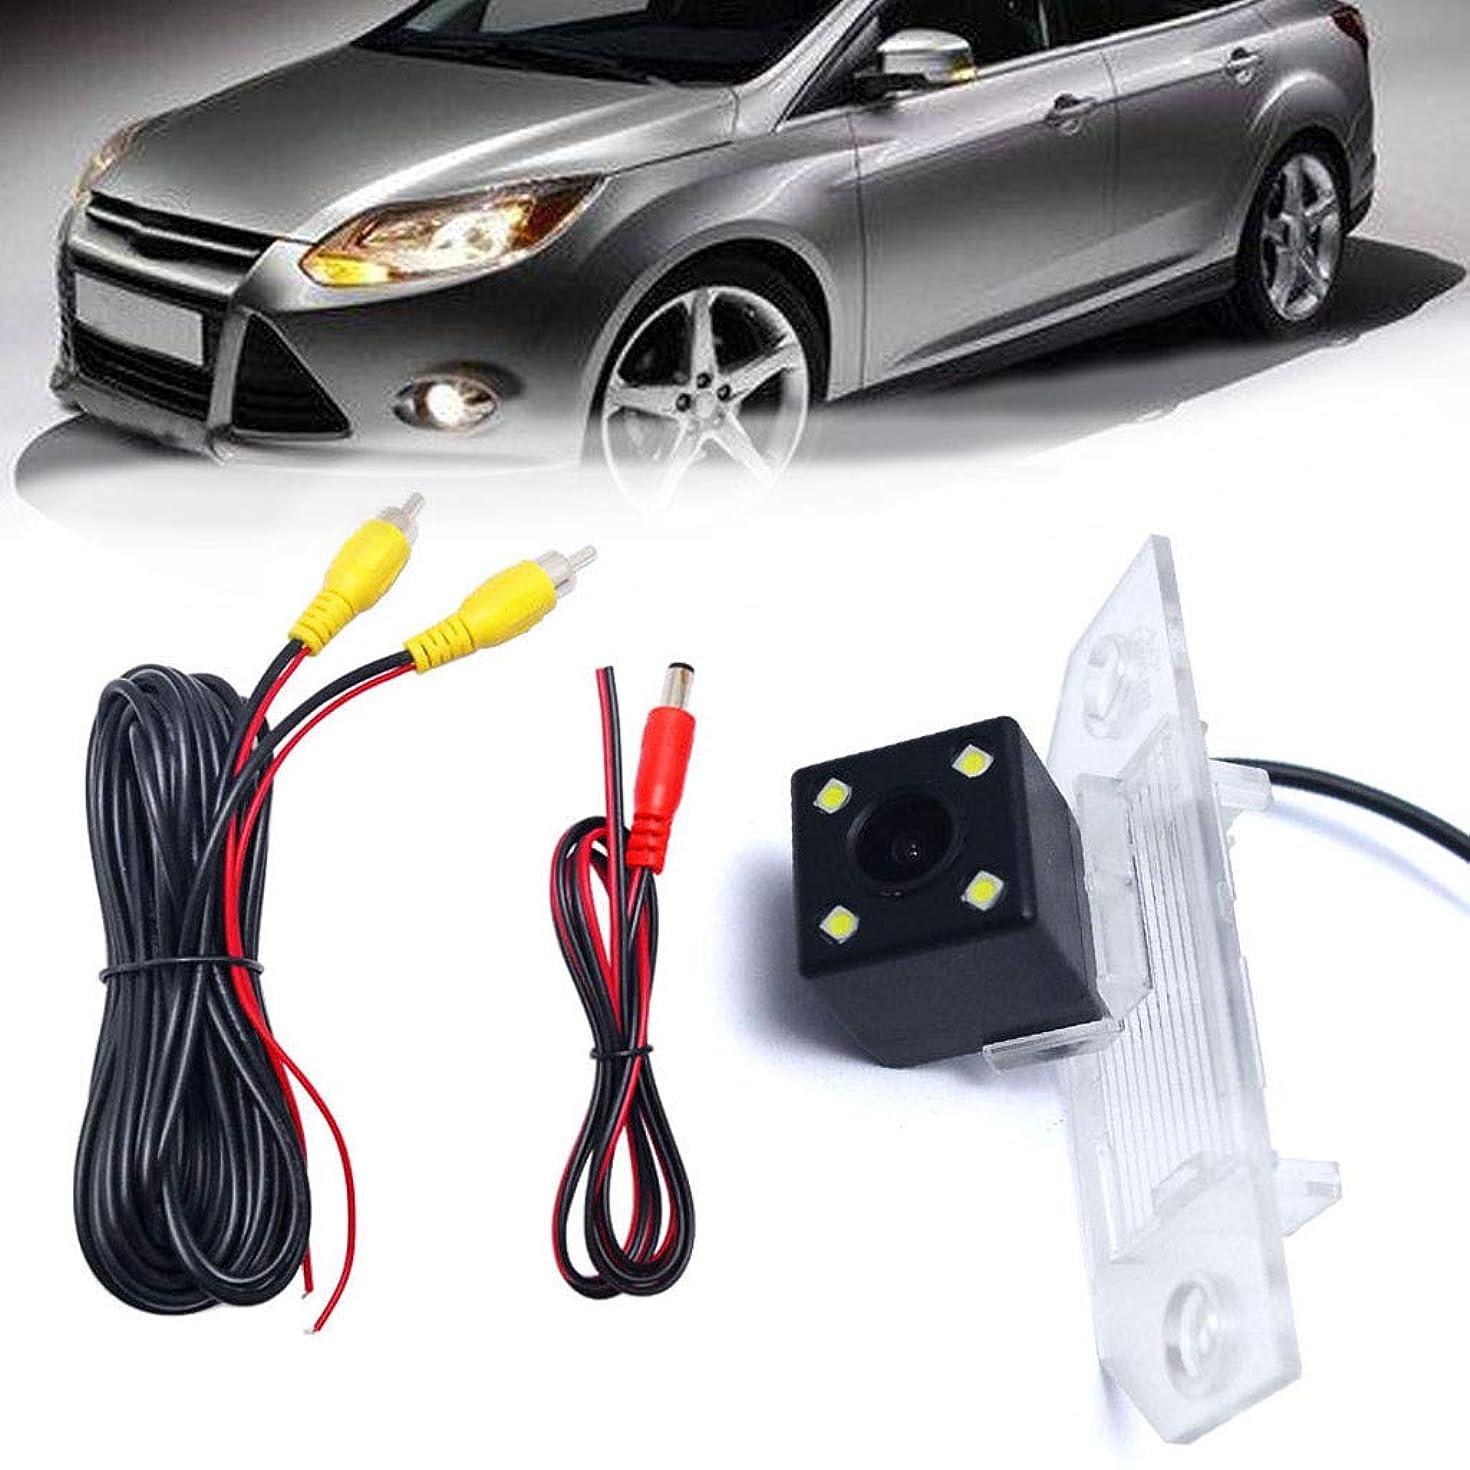 Saying Waterproof Car Backup Camera, Rear View Backup Camera with 4 LED for Ford Focus Sedan/Hatchback, Assist Park System Kit